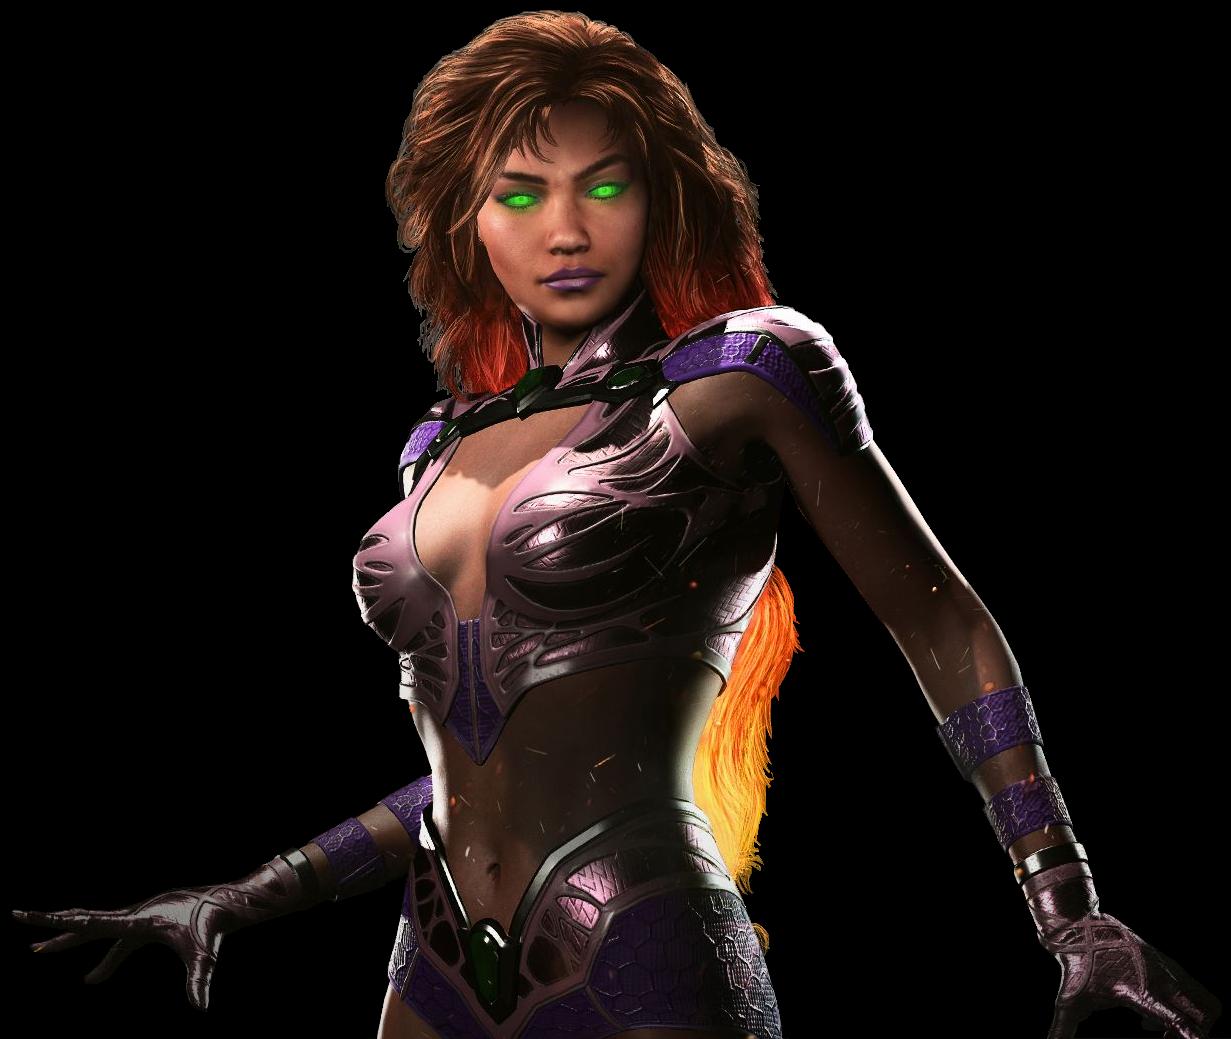 Starfire Injustice 2 Png Injustice 2 Wonder Woman Injustice